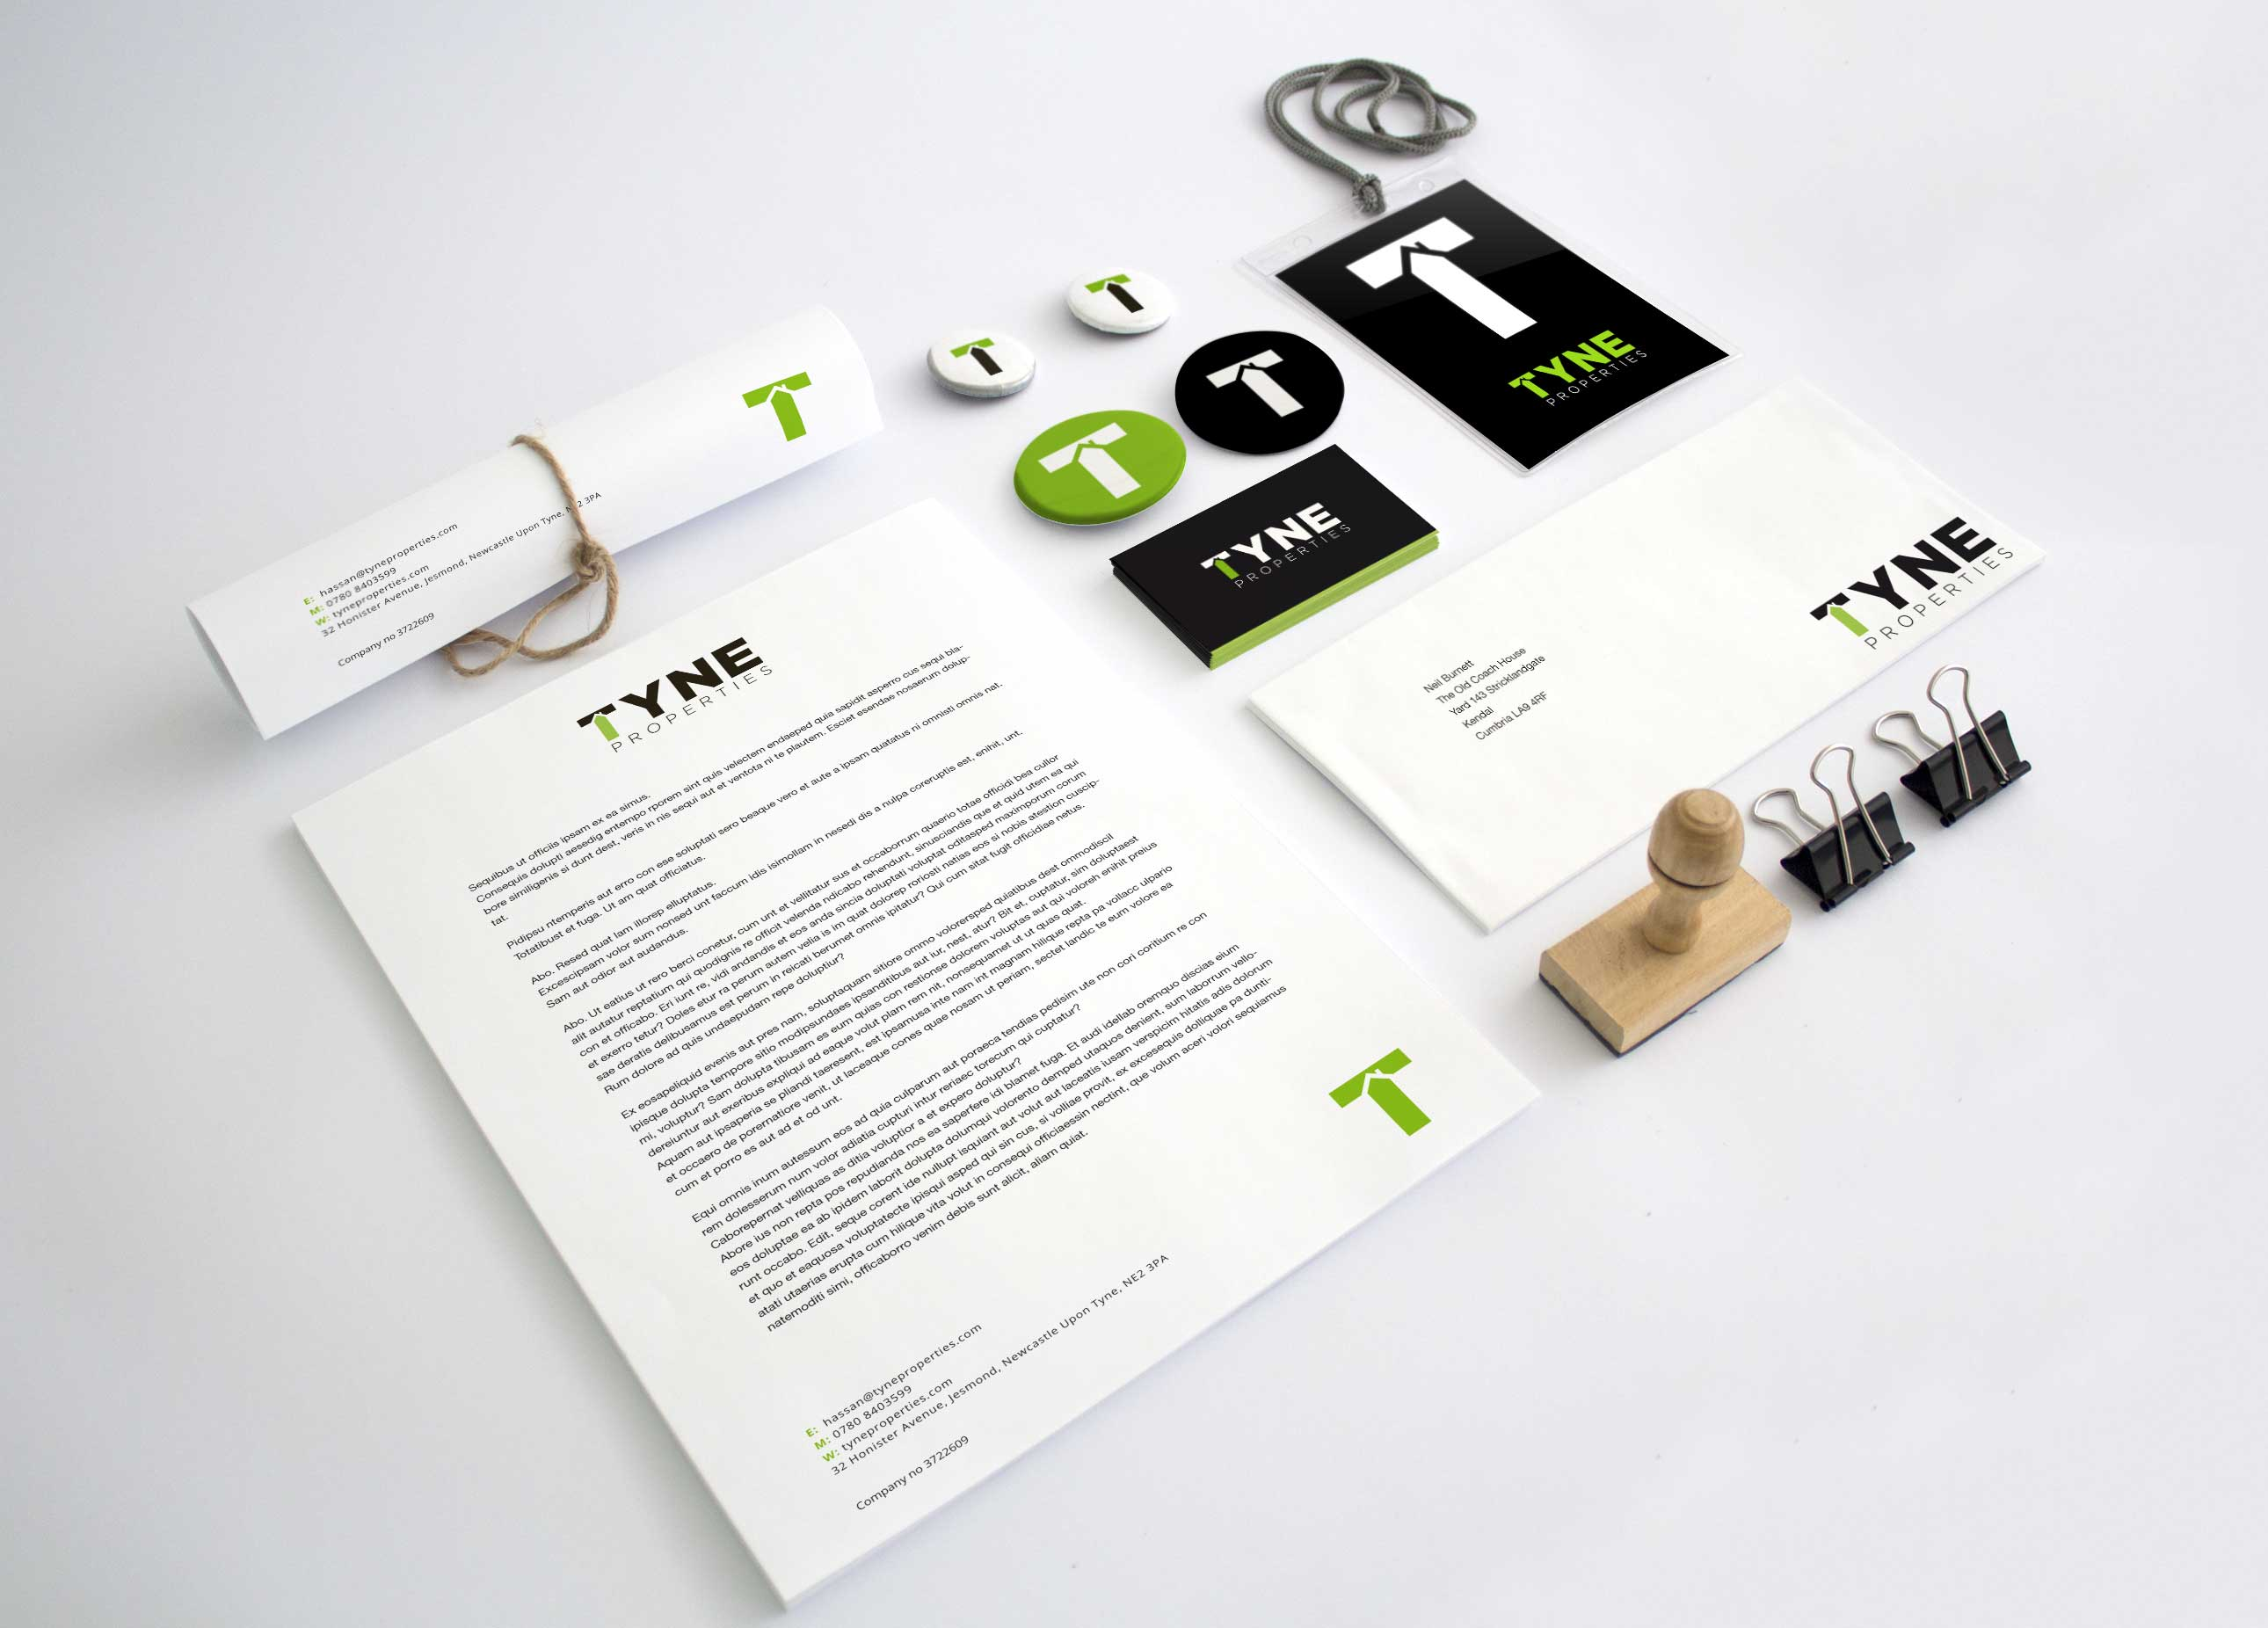 Branding design for print graphics.